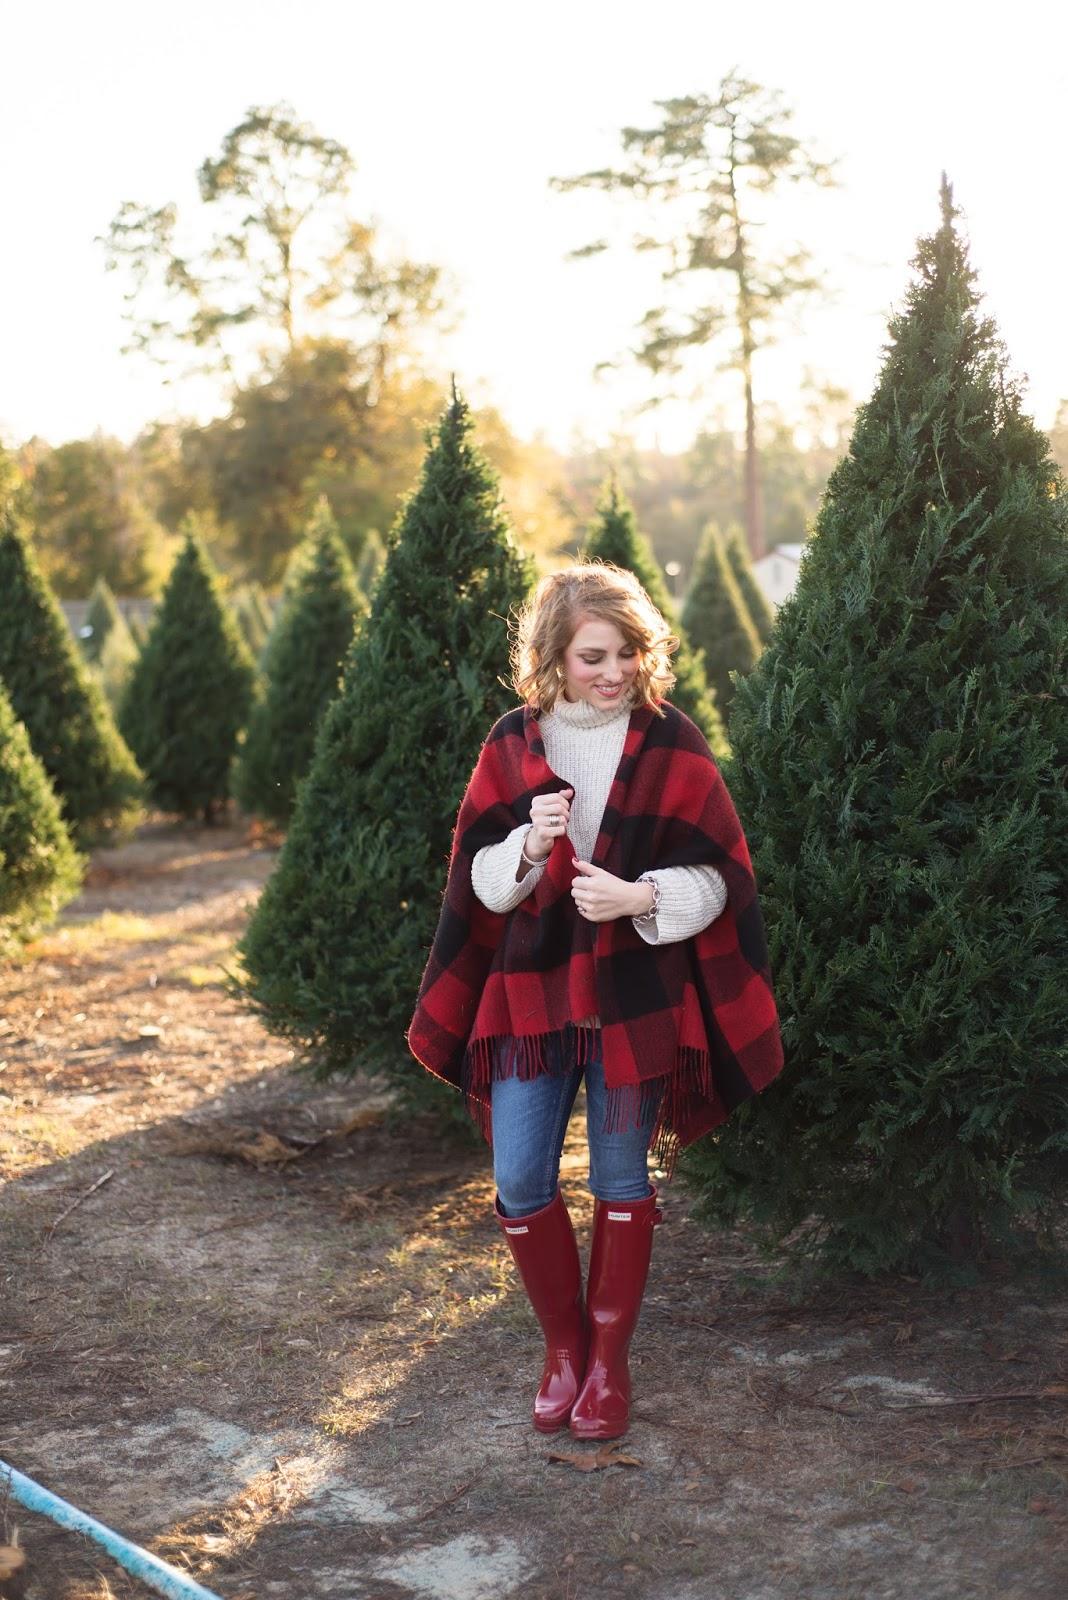 Red Hunter Boots - Something Delightful Blog